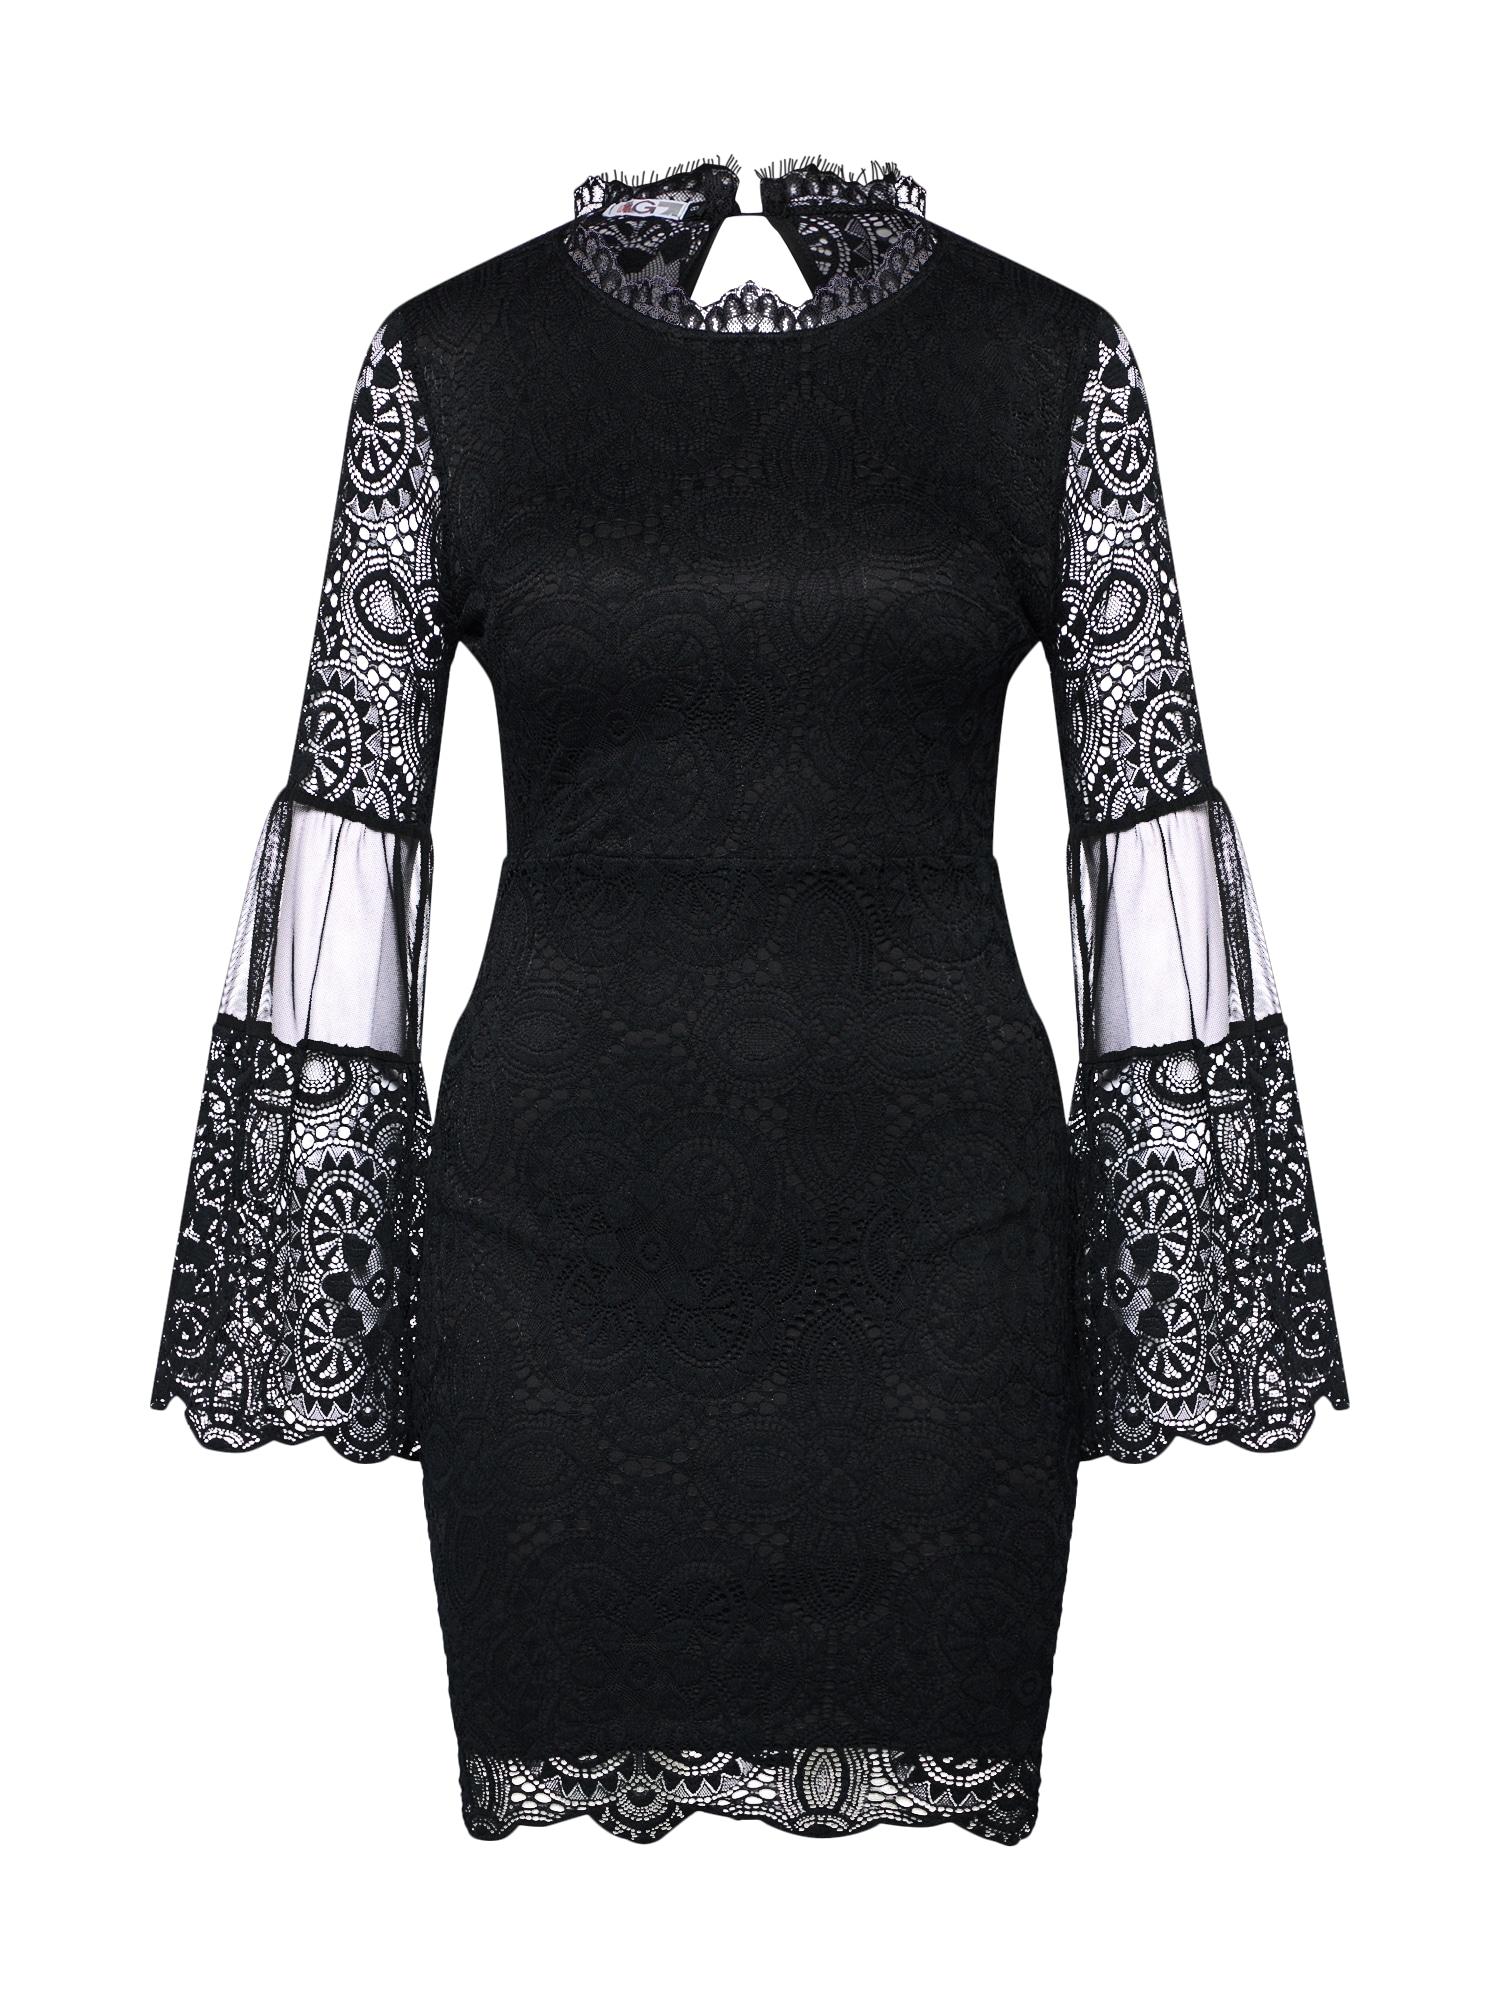 WAL G., Dames Cocktailjurk 'Dress', zwart